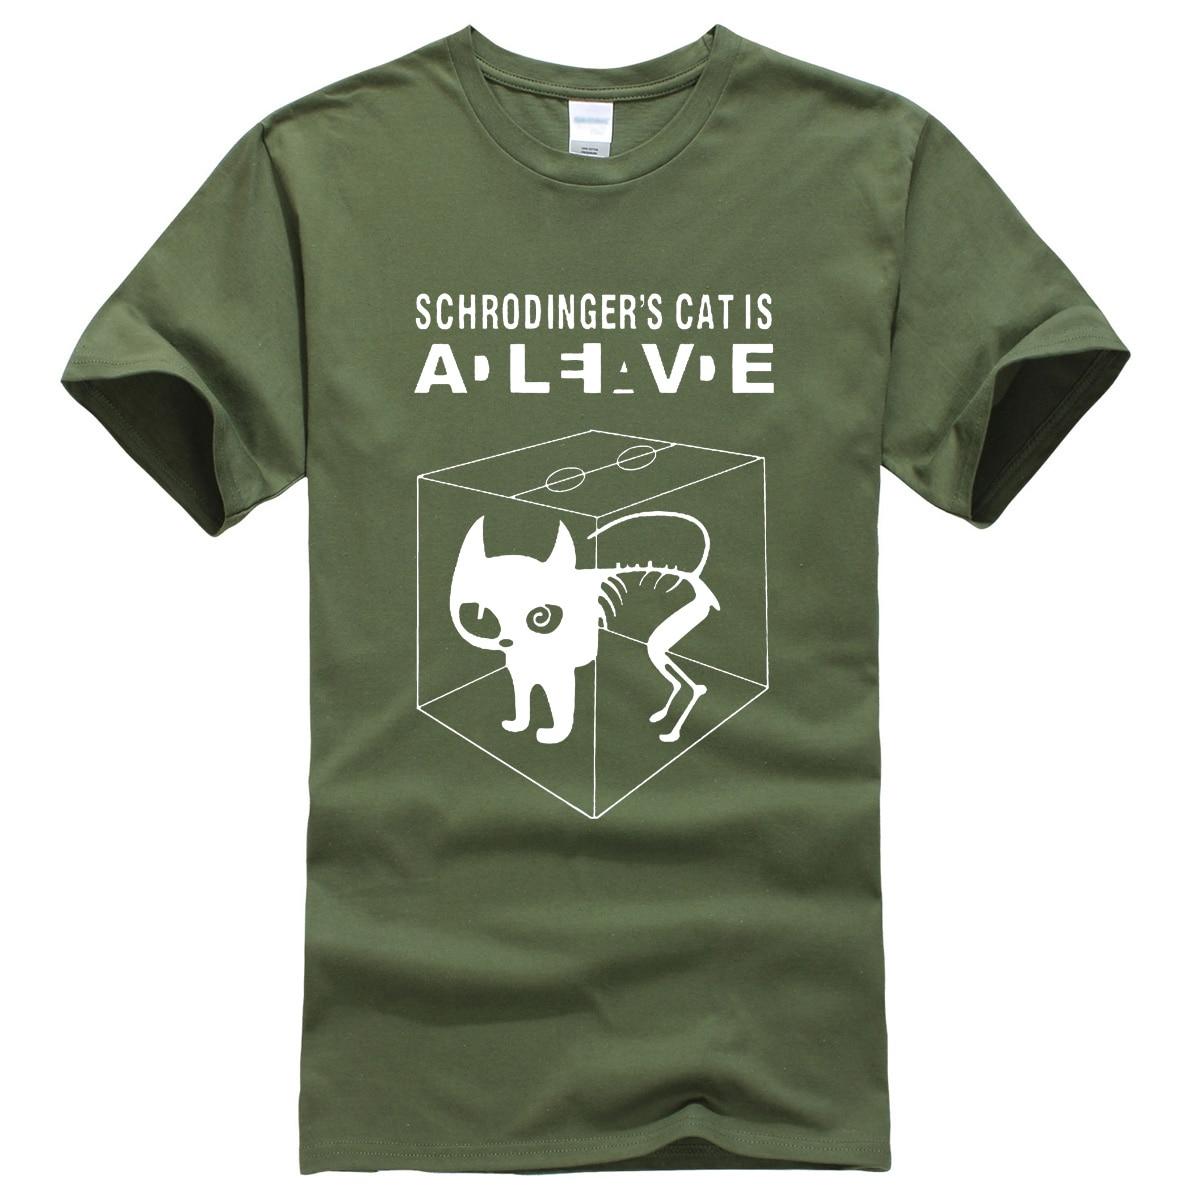 The Big Bang Theory Schrodinger's Cat men's   T  -  shirts   pattern 2019 summer fashion casual   t     shirt   streetwear hip hop brand top tee